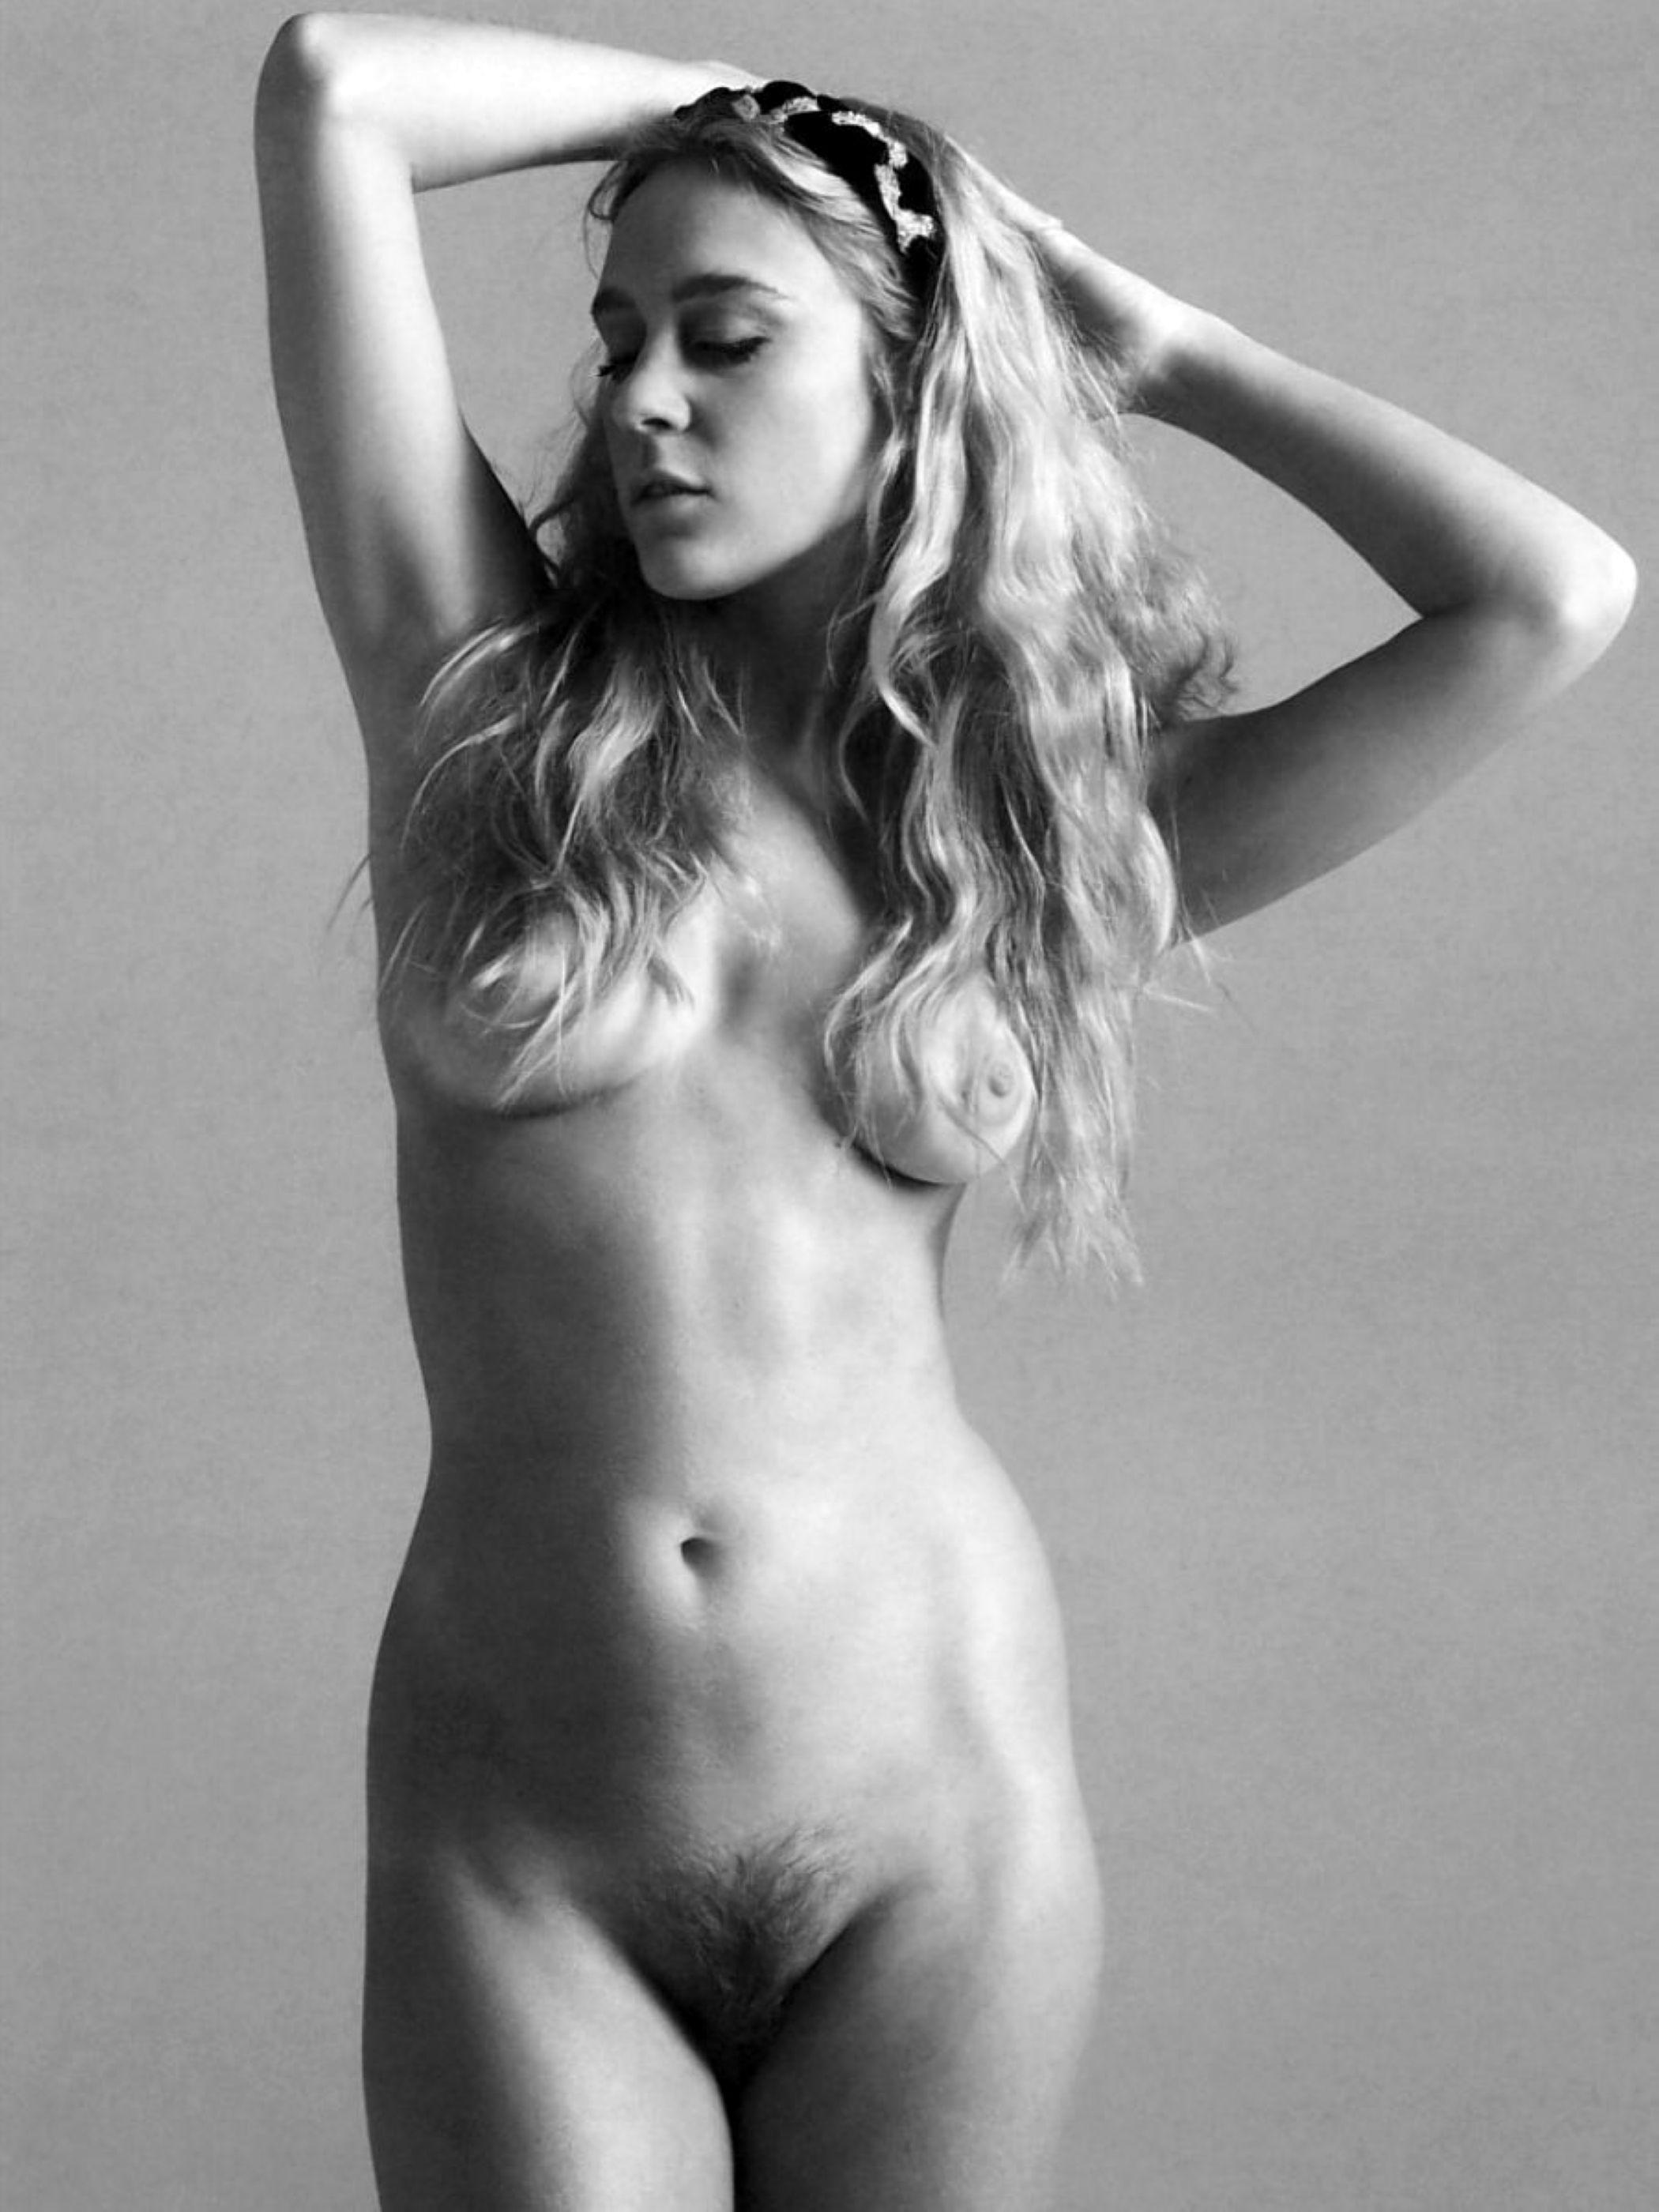 Chloe-Sevigny-Naked-1